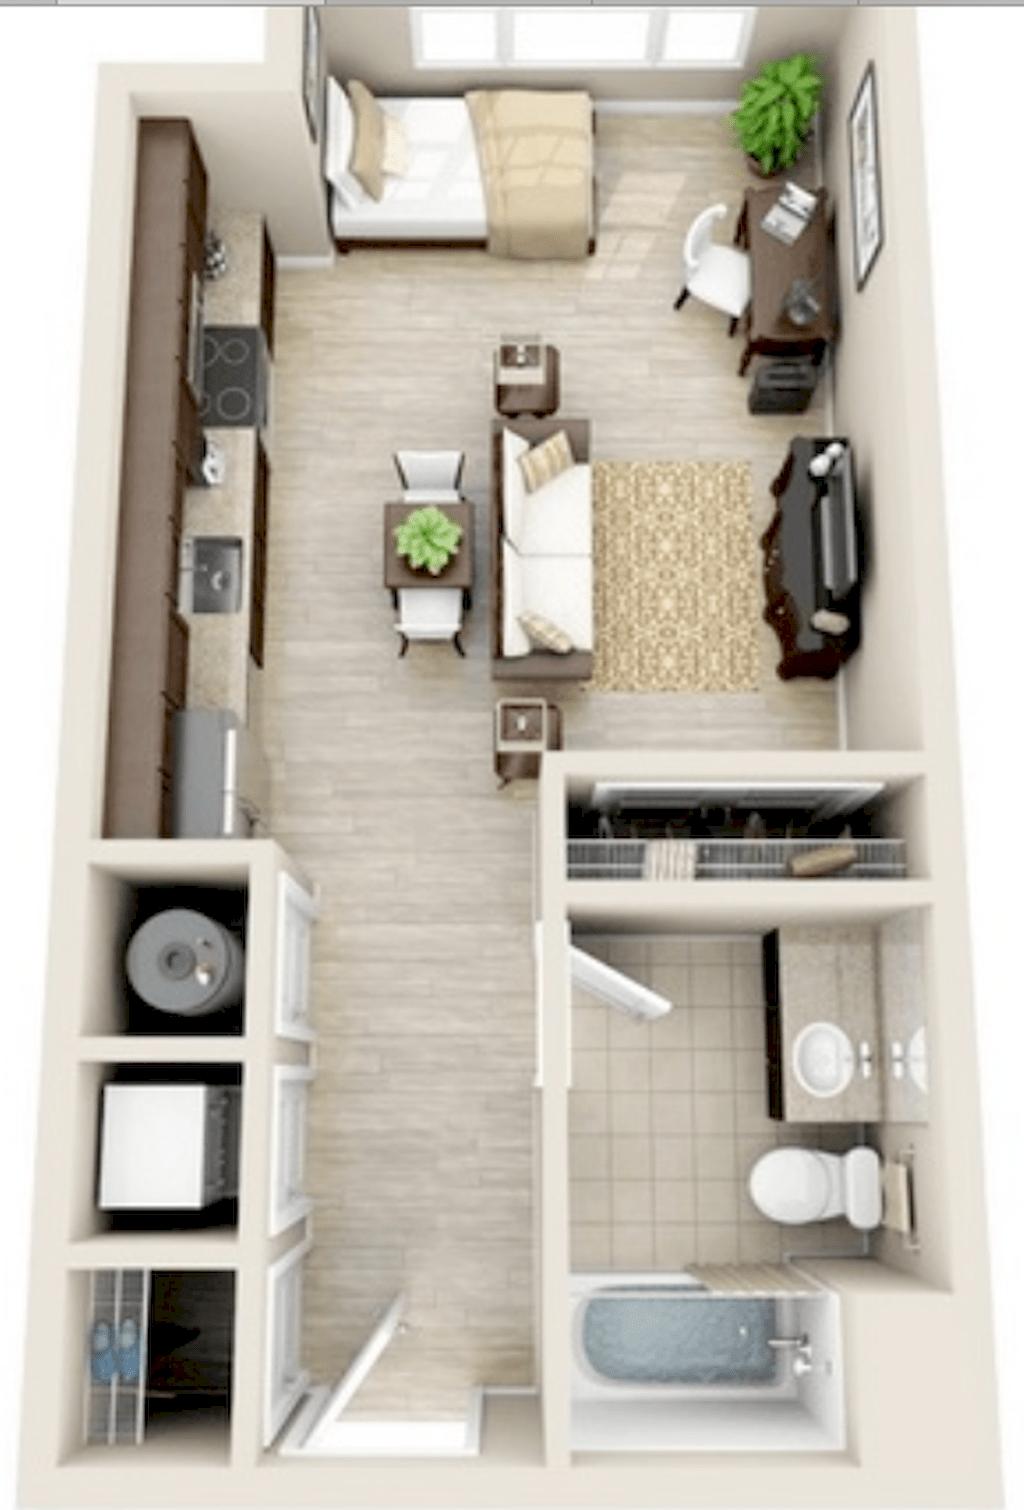 Stüdyo Daire Planlarına 17 Modern Örnek | Small apartment ...